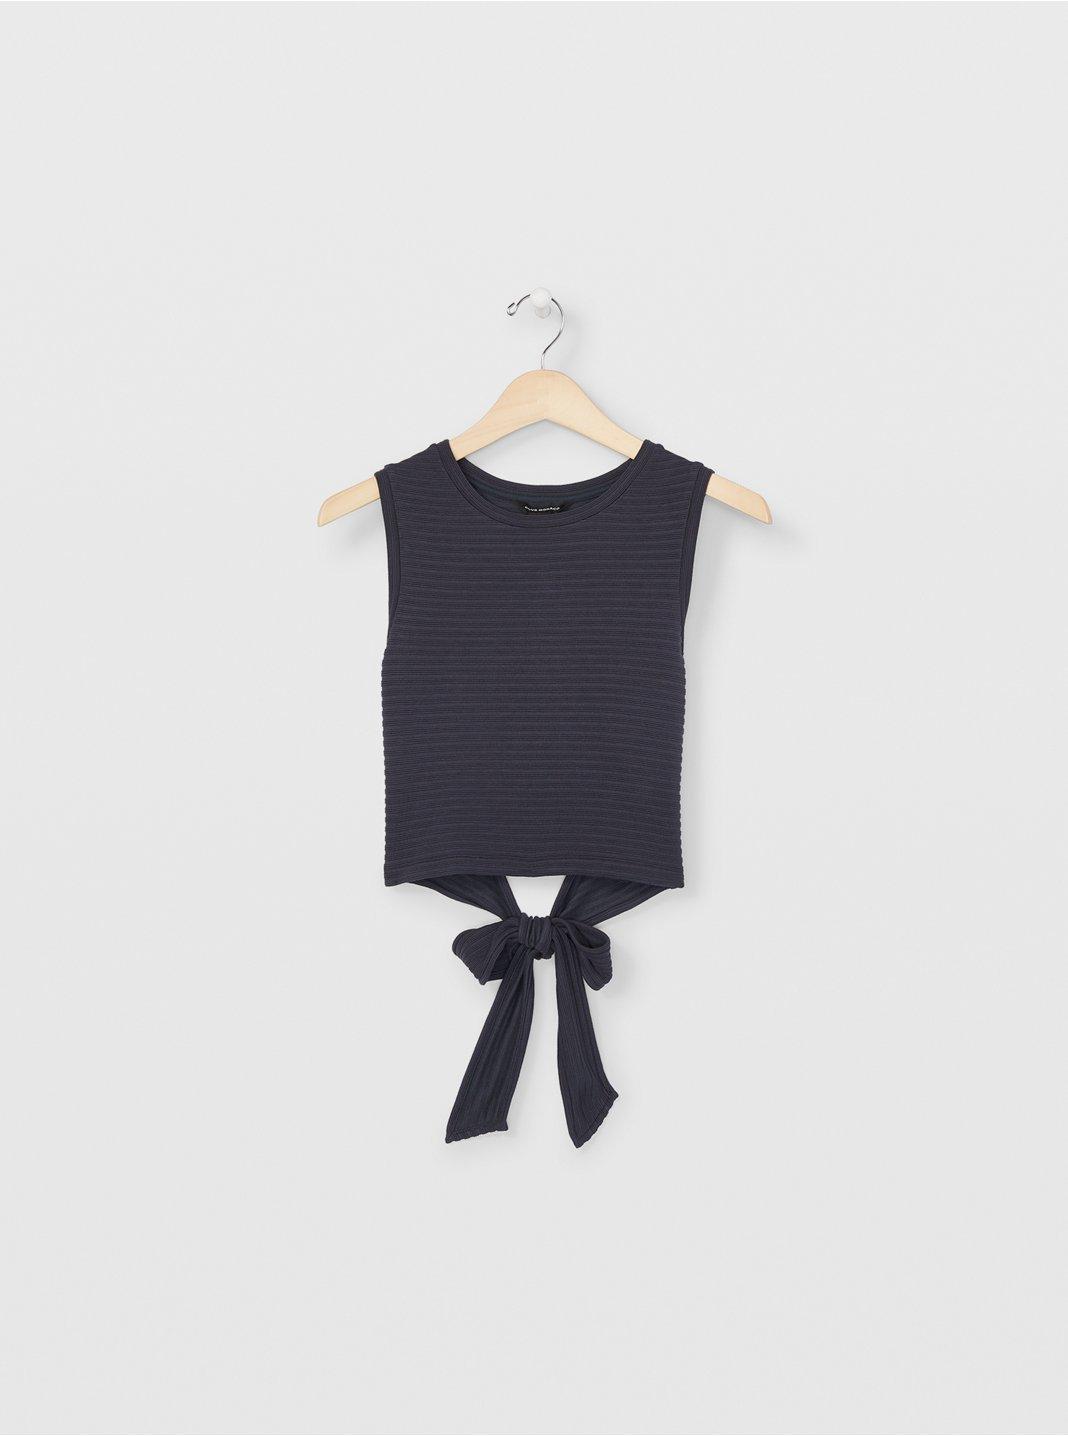 Sleeveless Tie Back Top